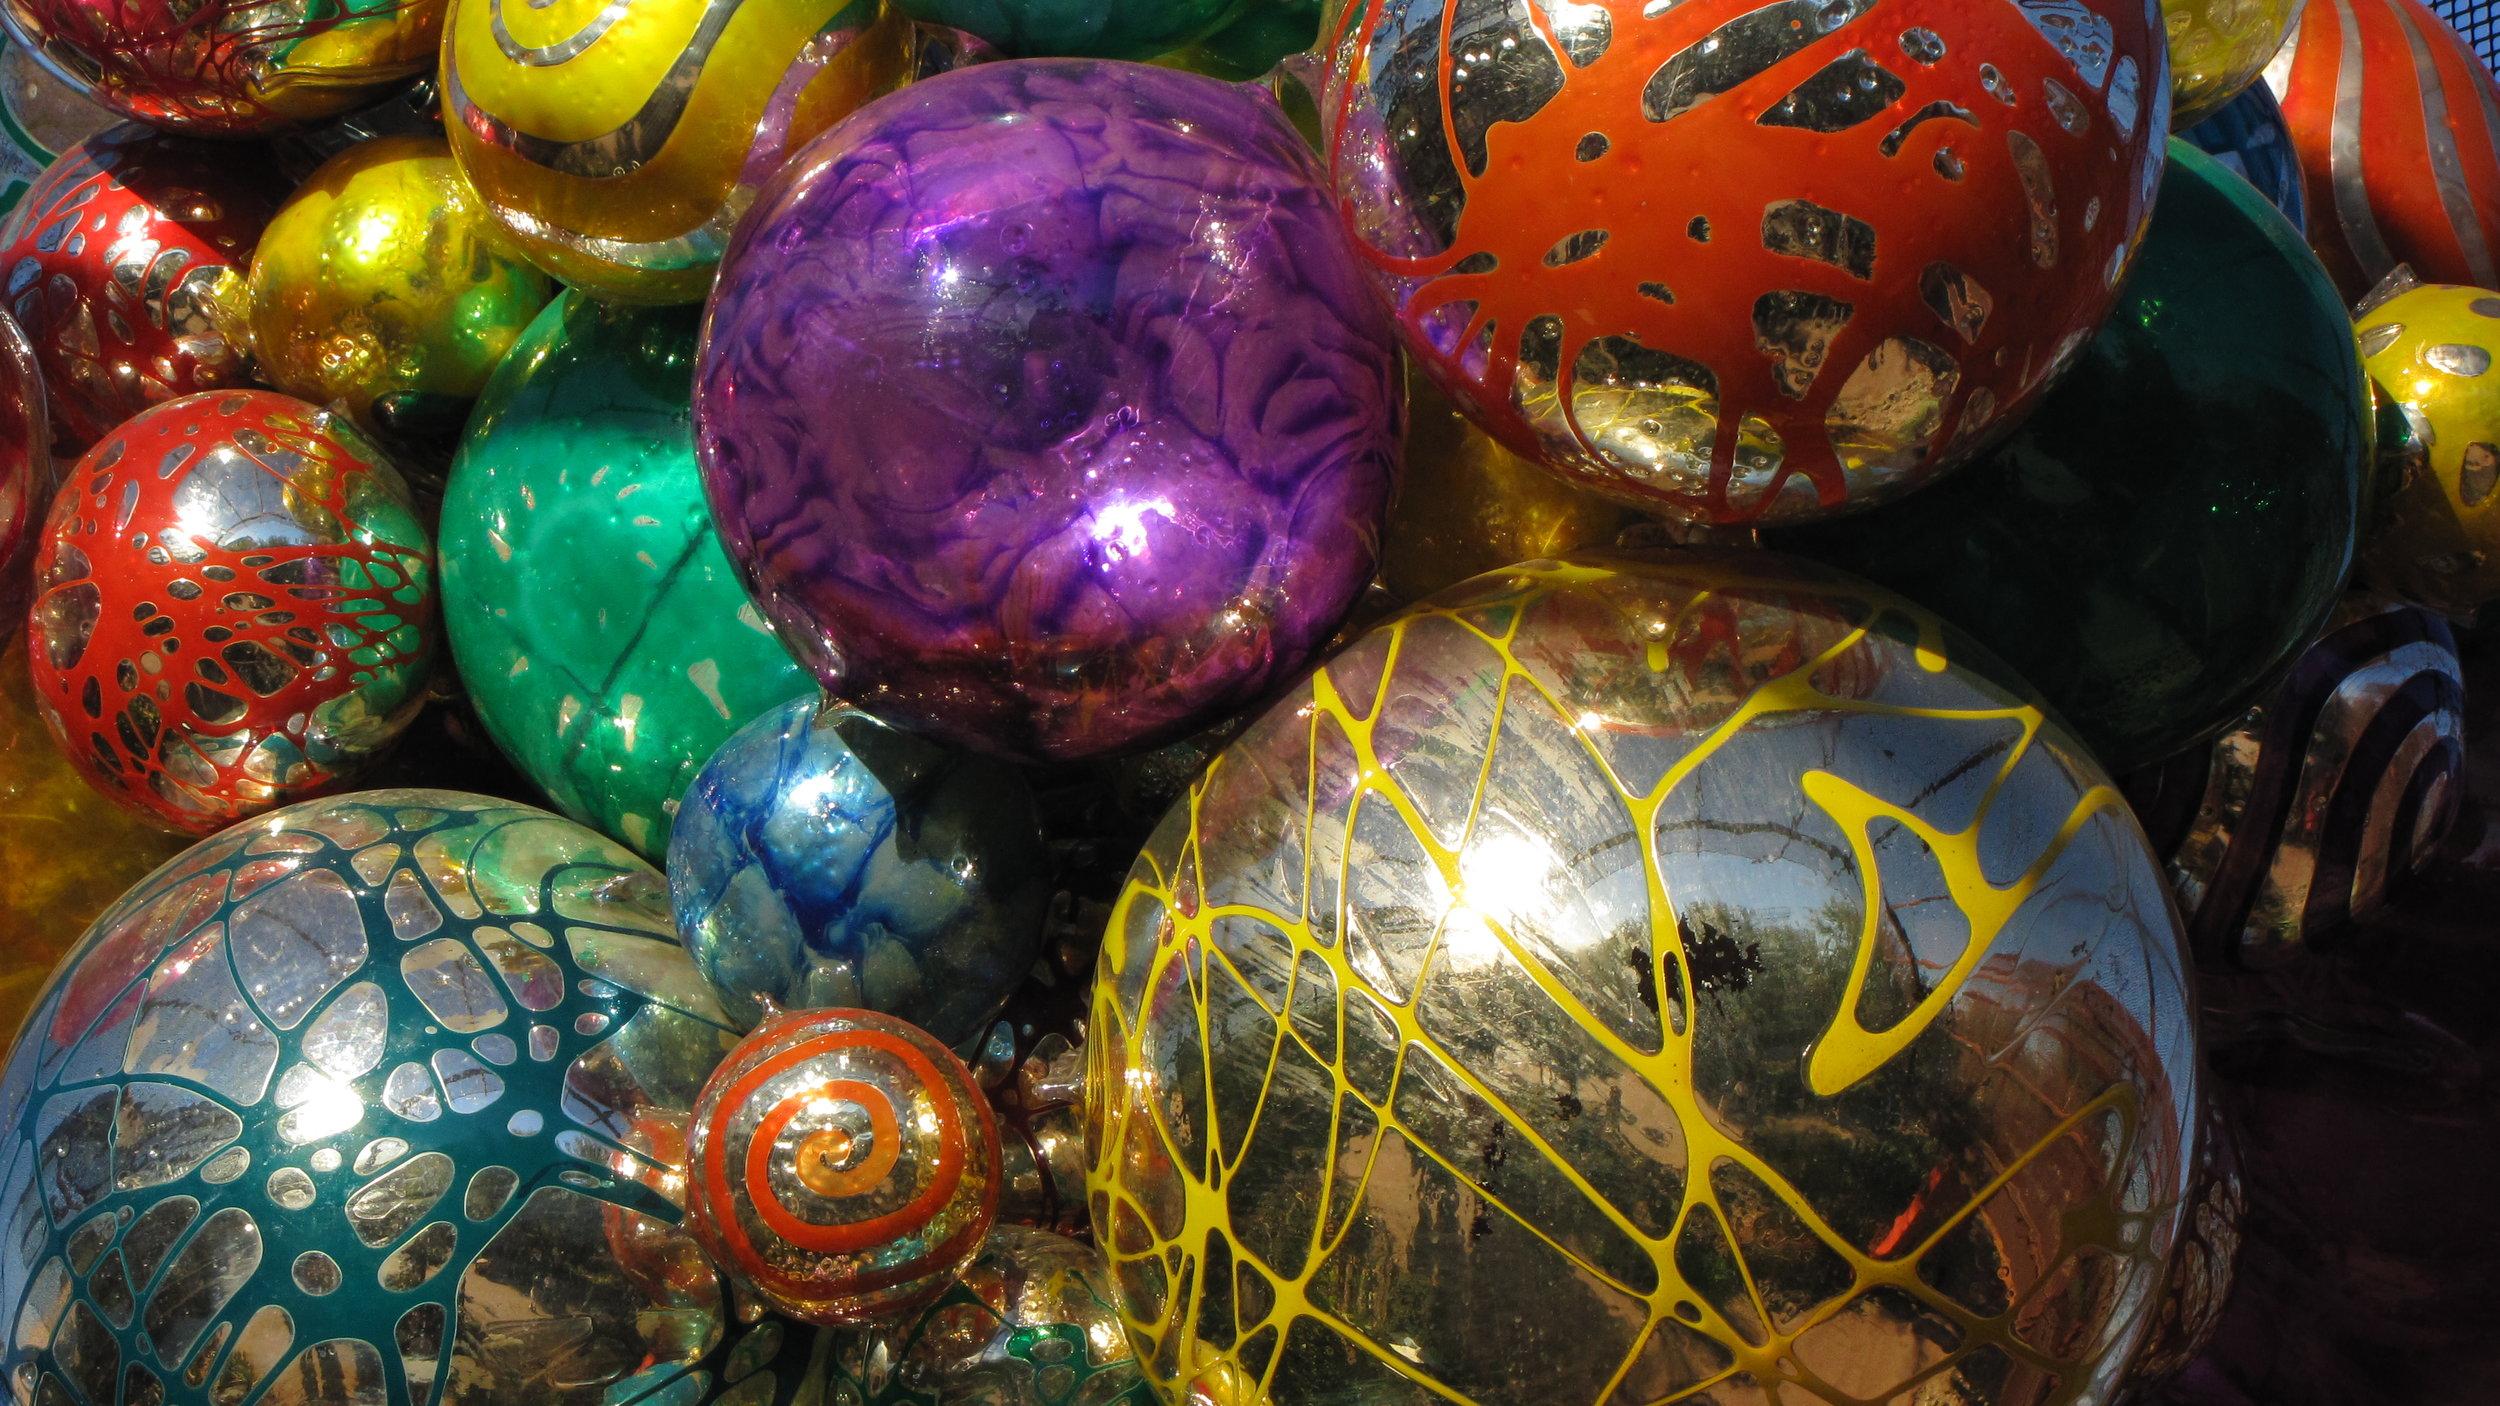 Chihuly's Balls - Desert Botanical Gardens, Phoenix, AZ